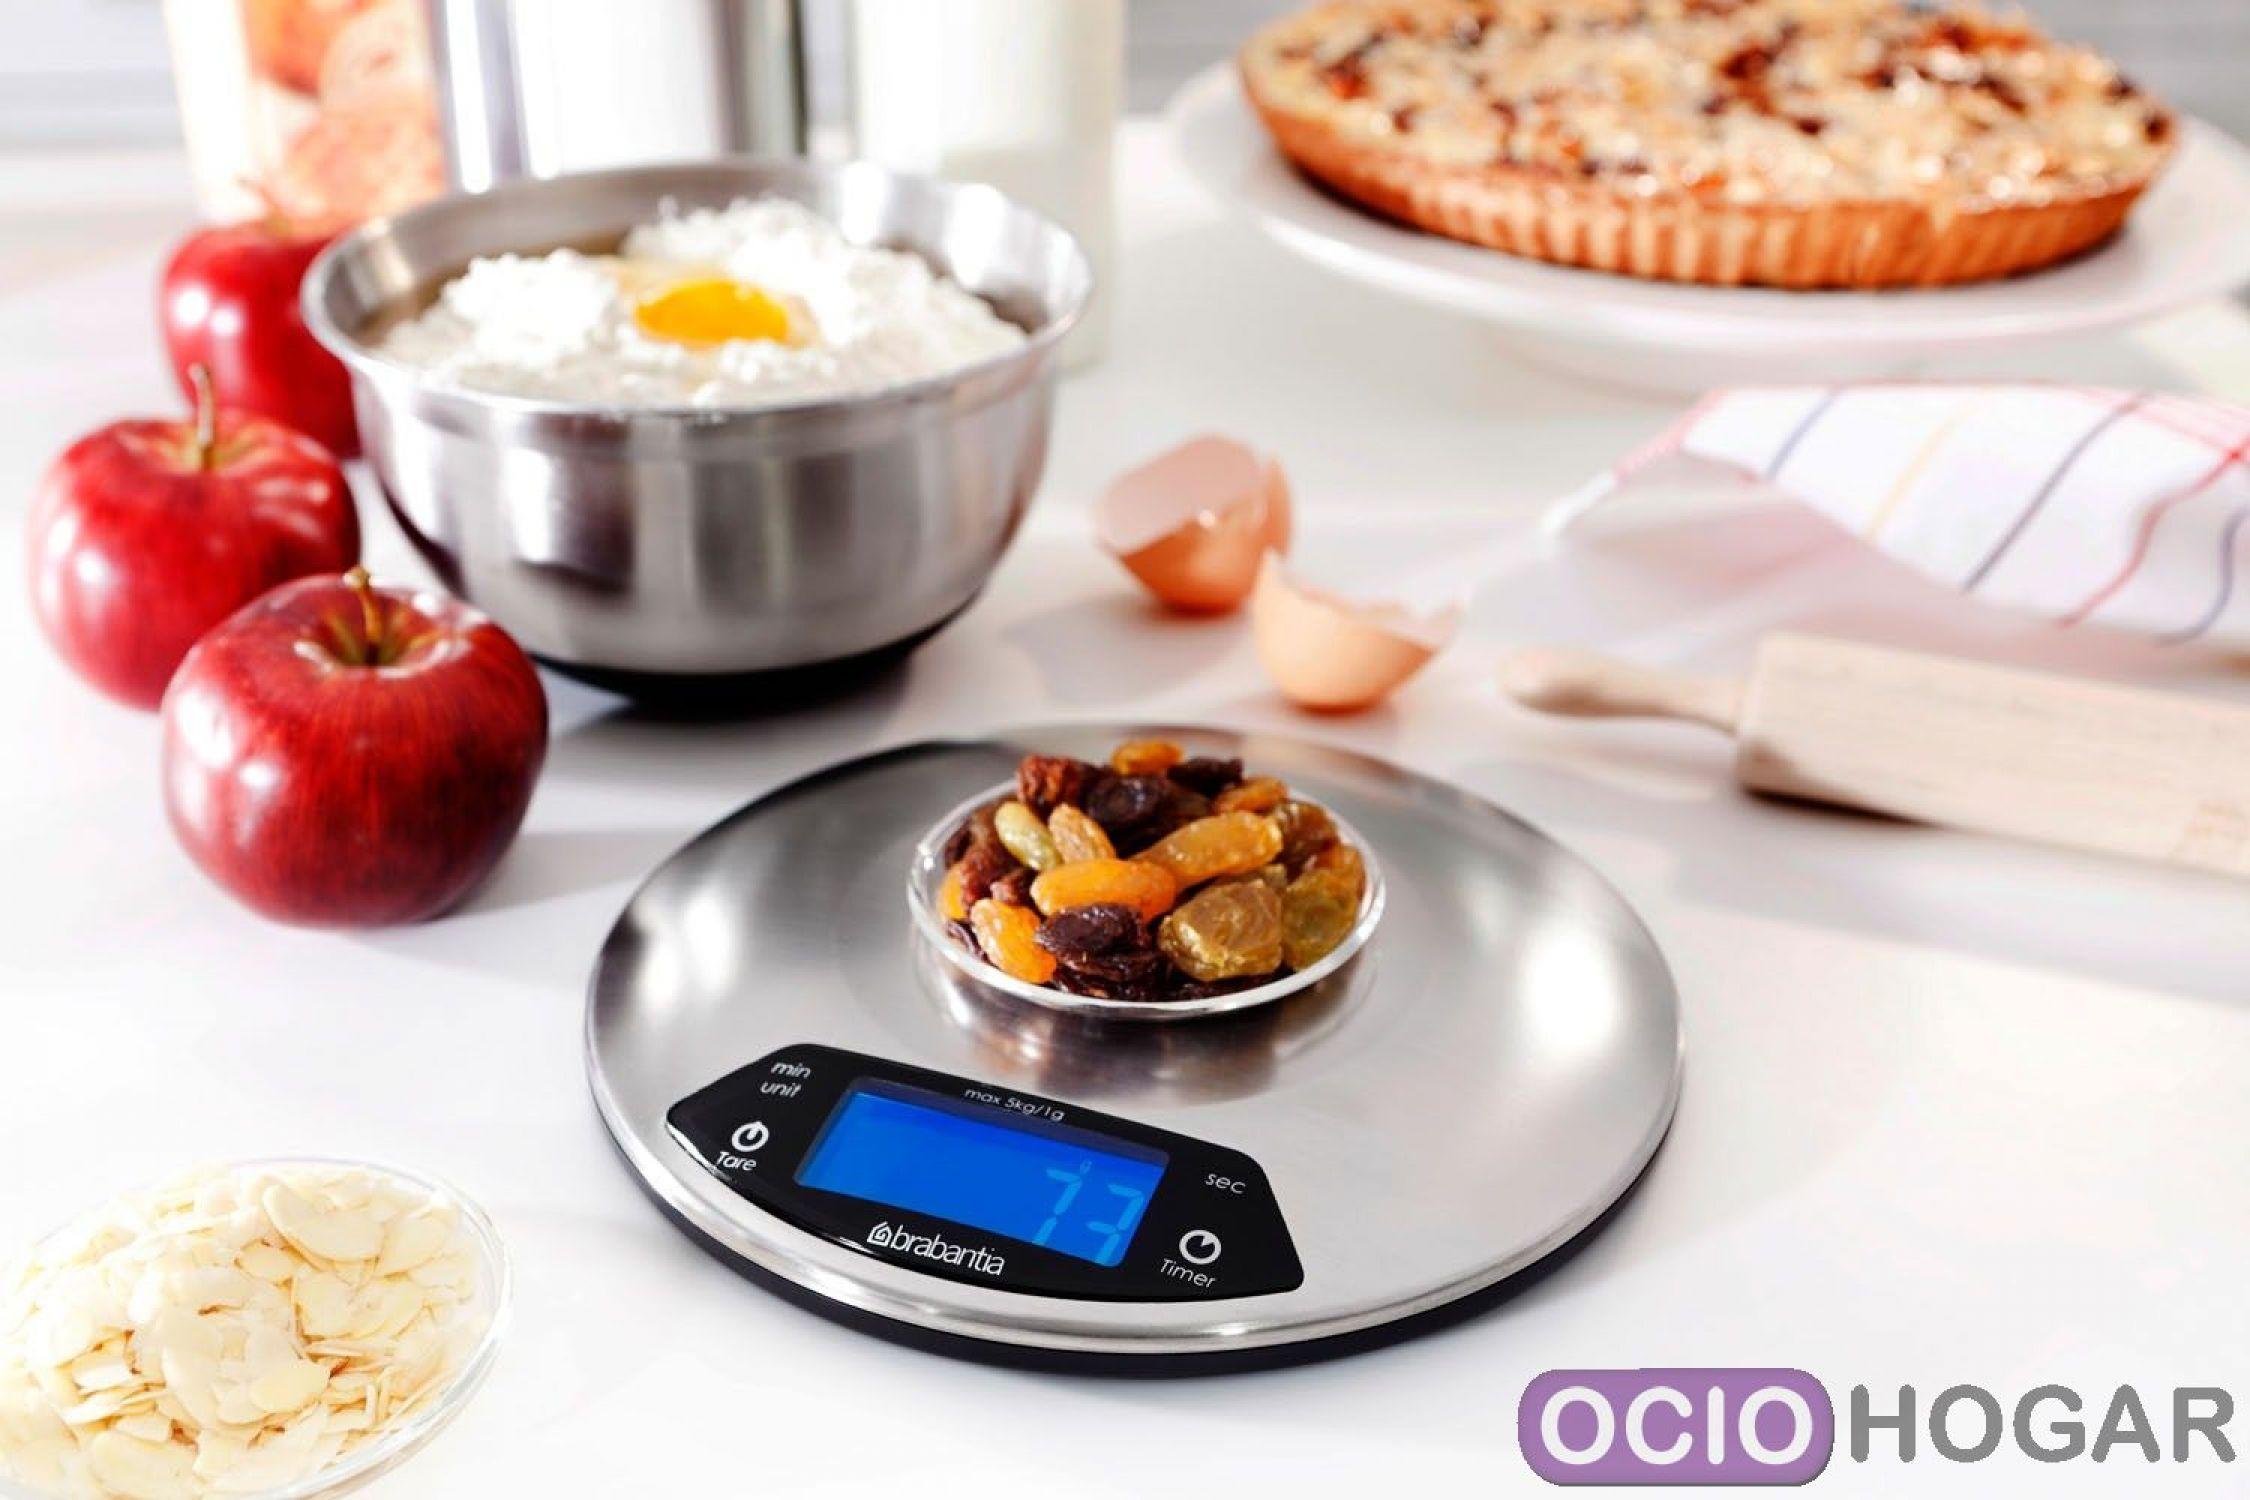 B scula de cocina digital matt steel de brabantia - Basculas de cocina digitales ...